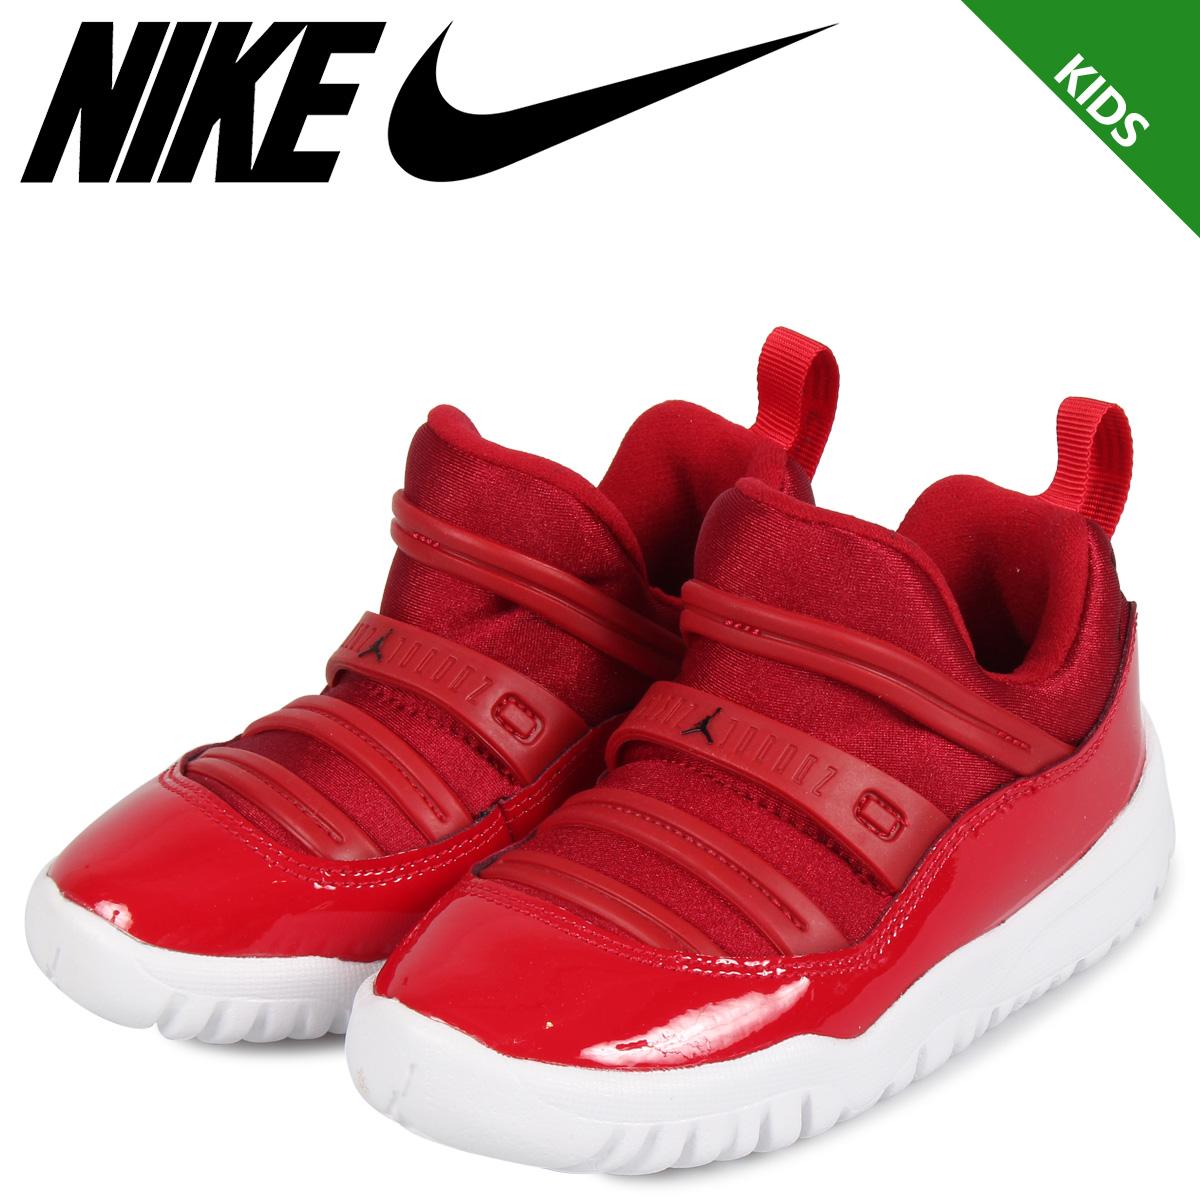 b3ec4c0f13 NIKE Nike Air Jordan 11 nostalgic sneakers slip-ons kids AIR JORDAN 11  RETRO LITTLE FLEX PS red BQ7101-623 [7/26 Shinnyu load]